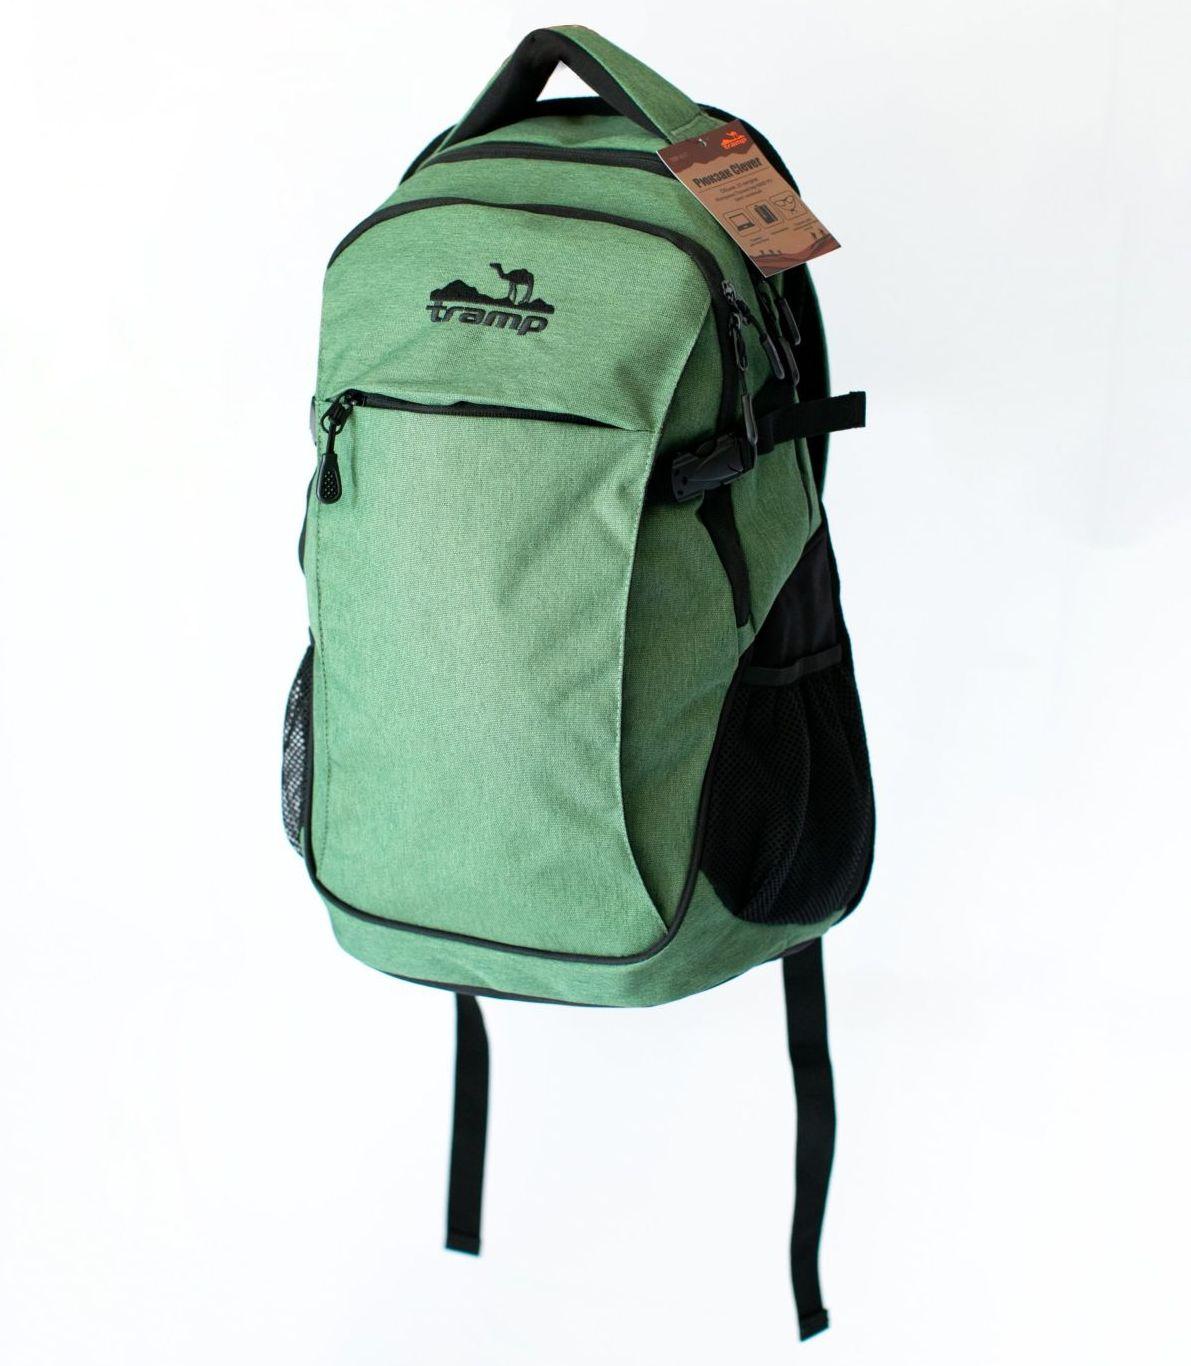 Рюкзак Tramp Clever TRP-037-green 25 л зеленый